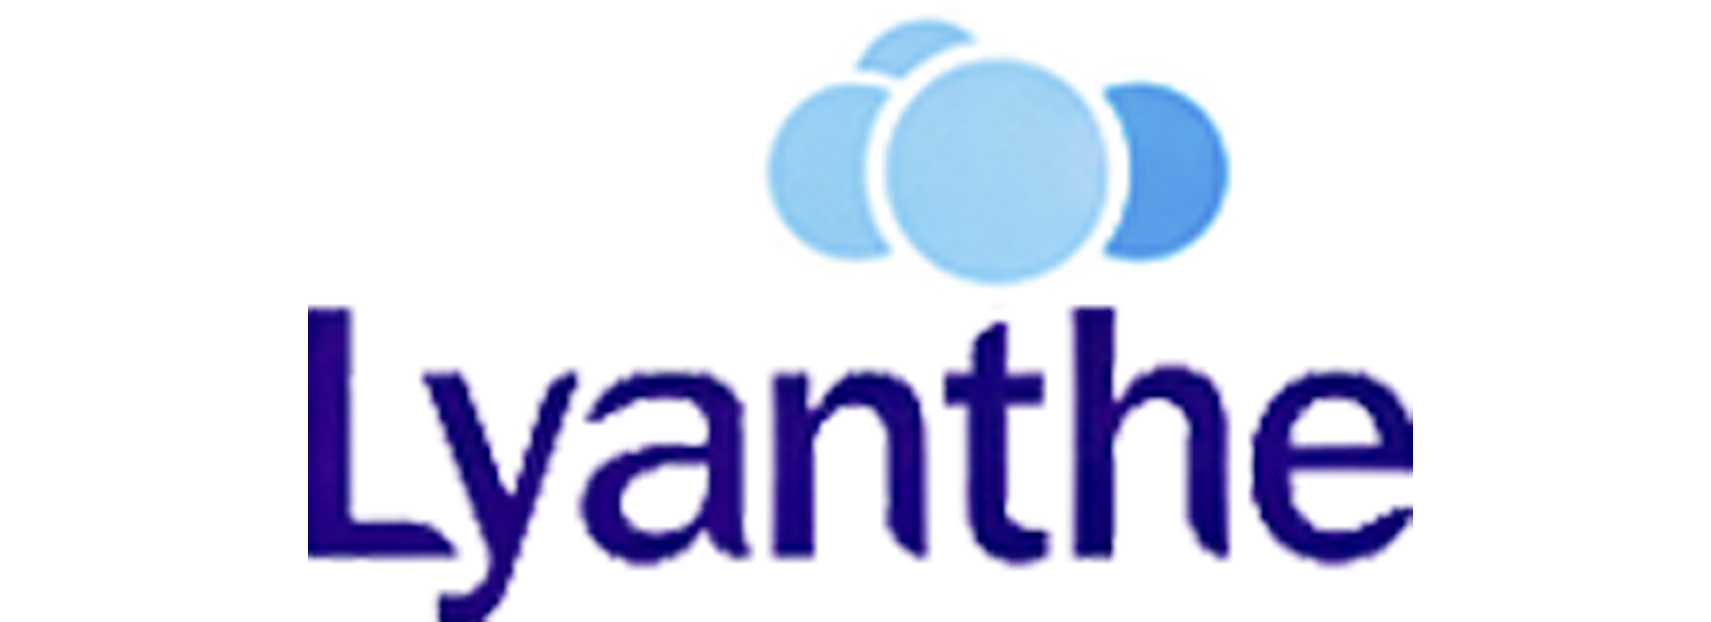 Lyanthe